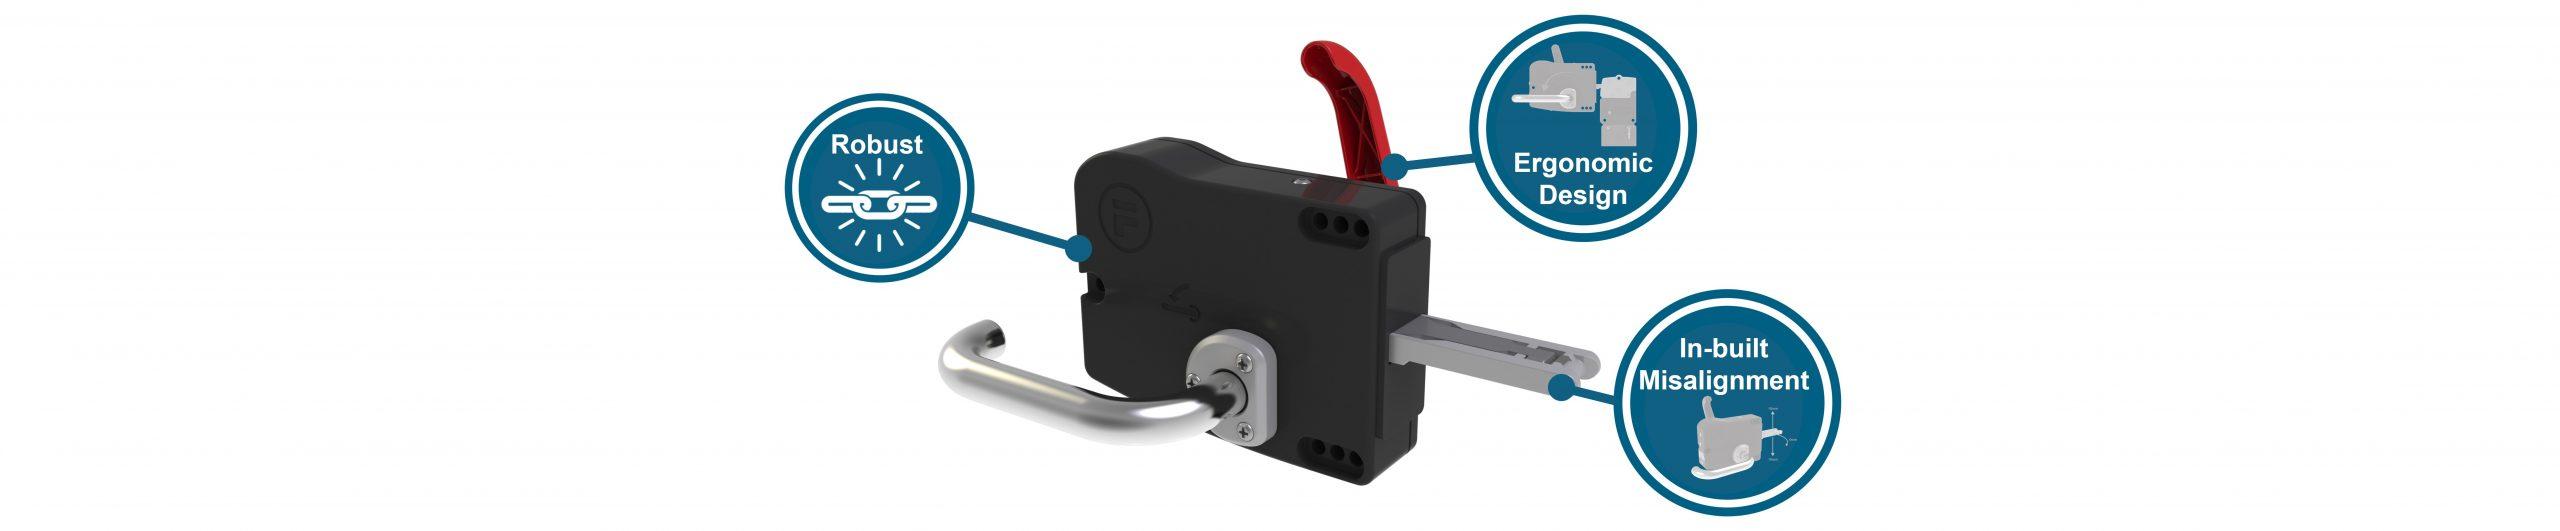 EI handle Key Features